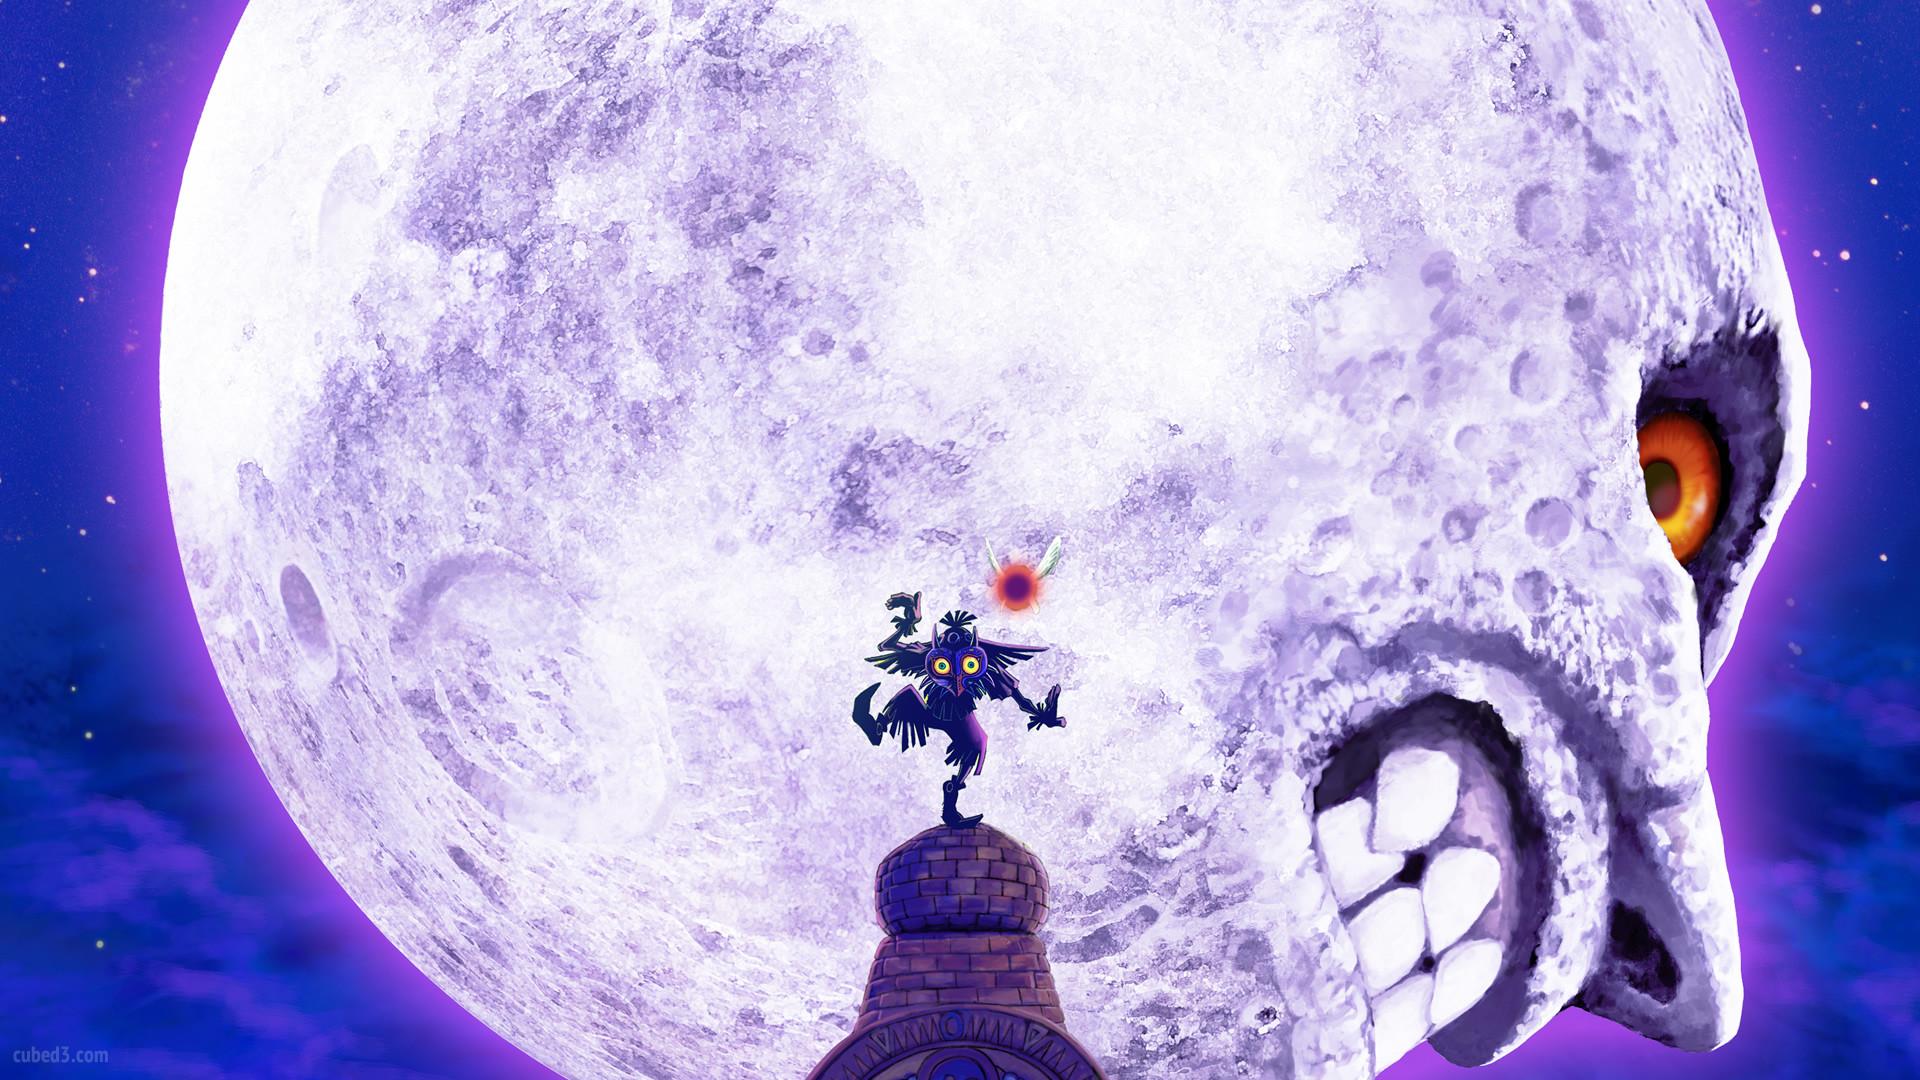 The Legend of Zelda: Majora's Mask - The VGProfessional Review